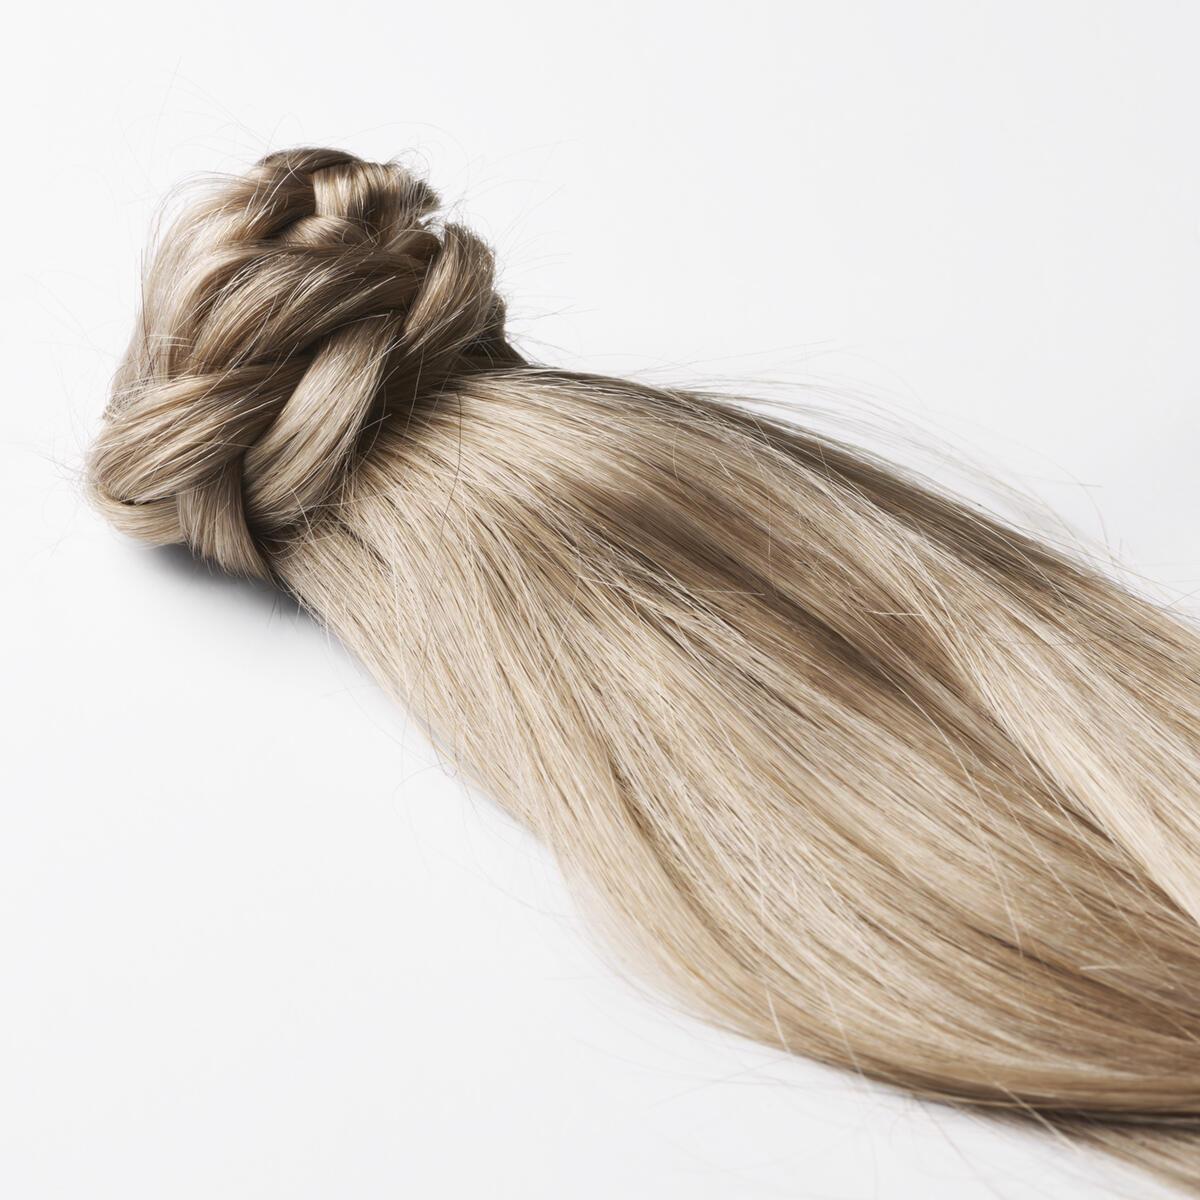 Clip-in Ponytail B7.5/10.7 Sandy Blonde Balayage 50 cm